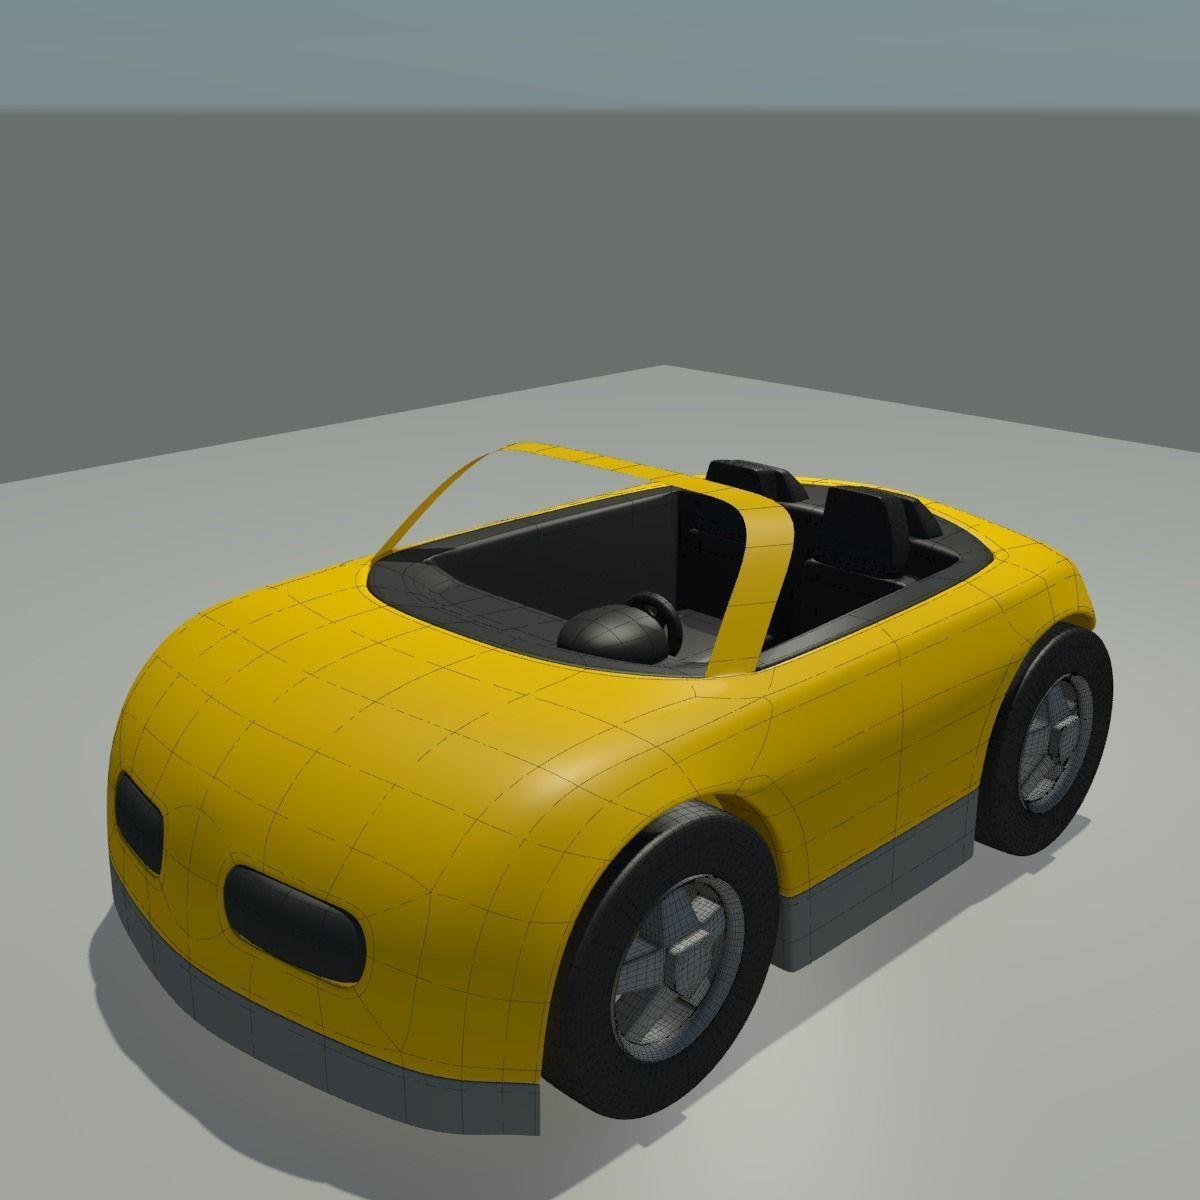 3D Toy Car model